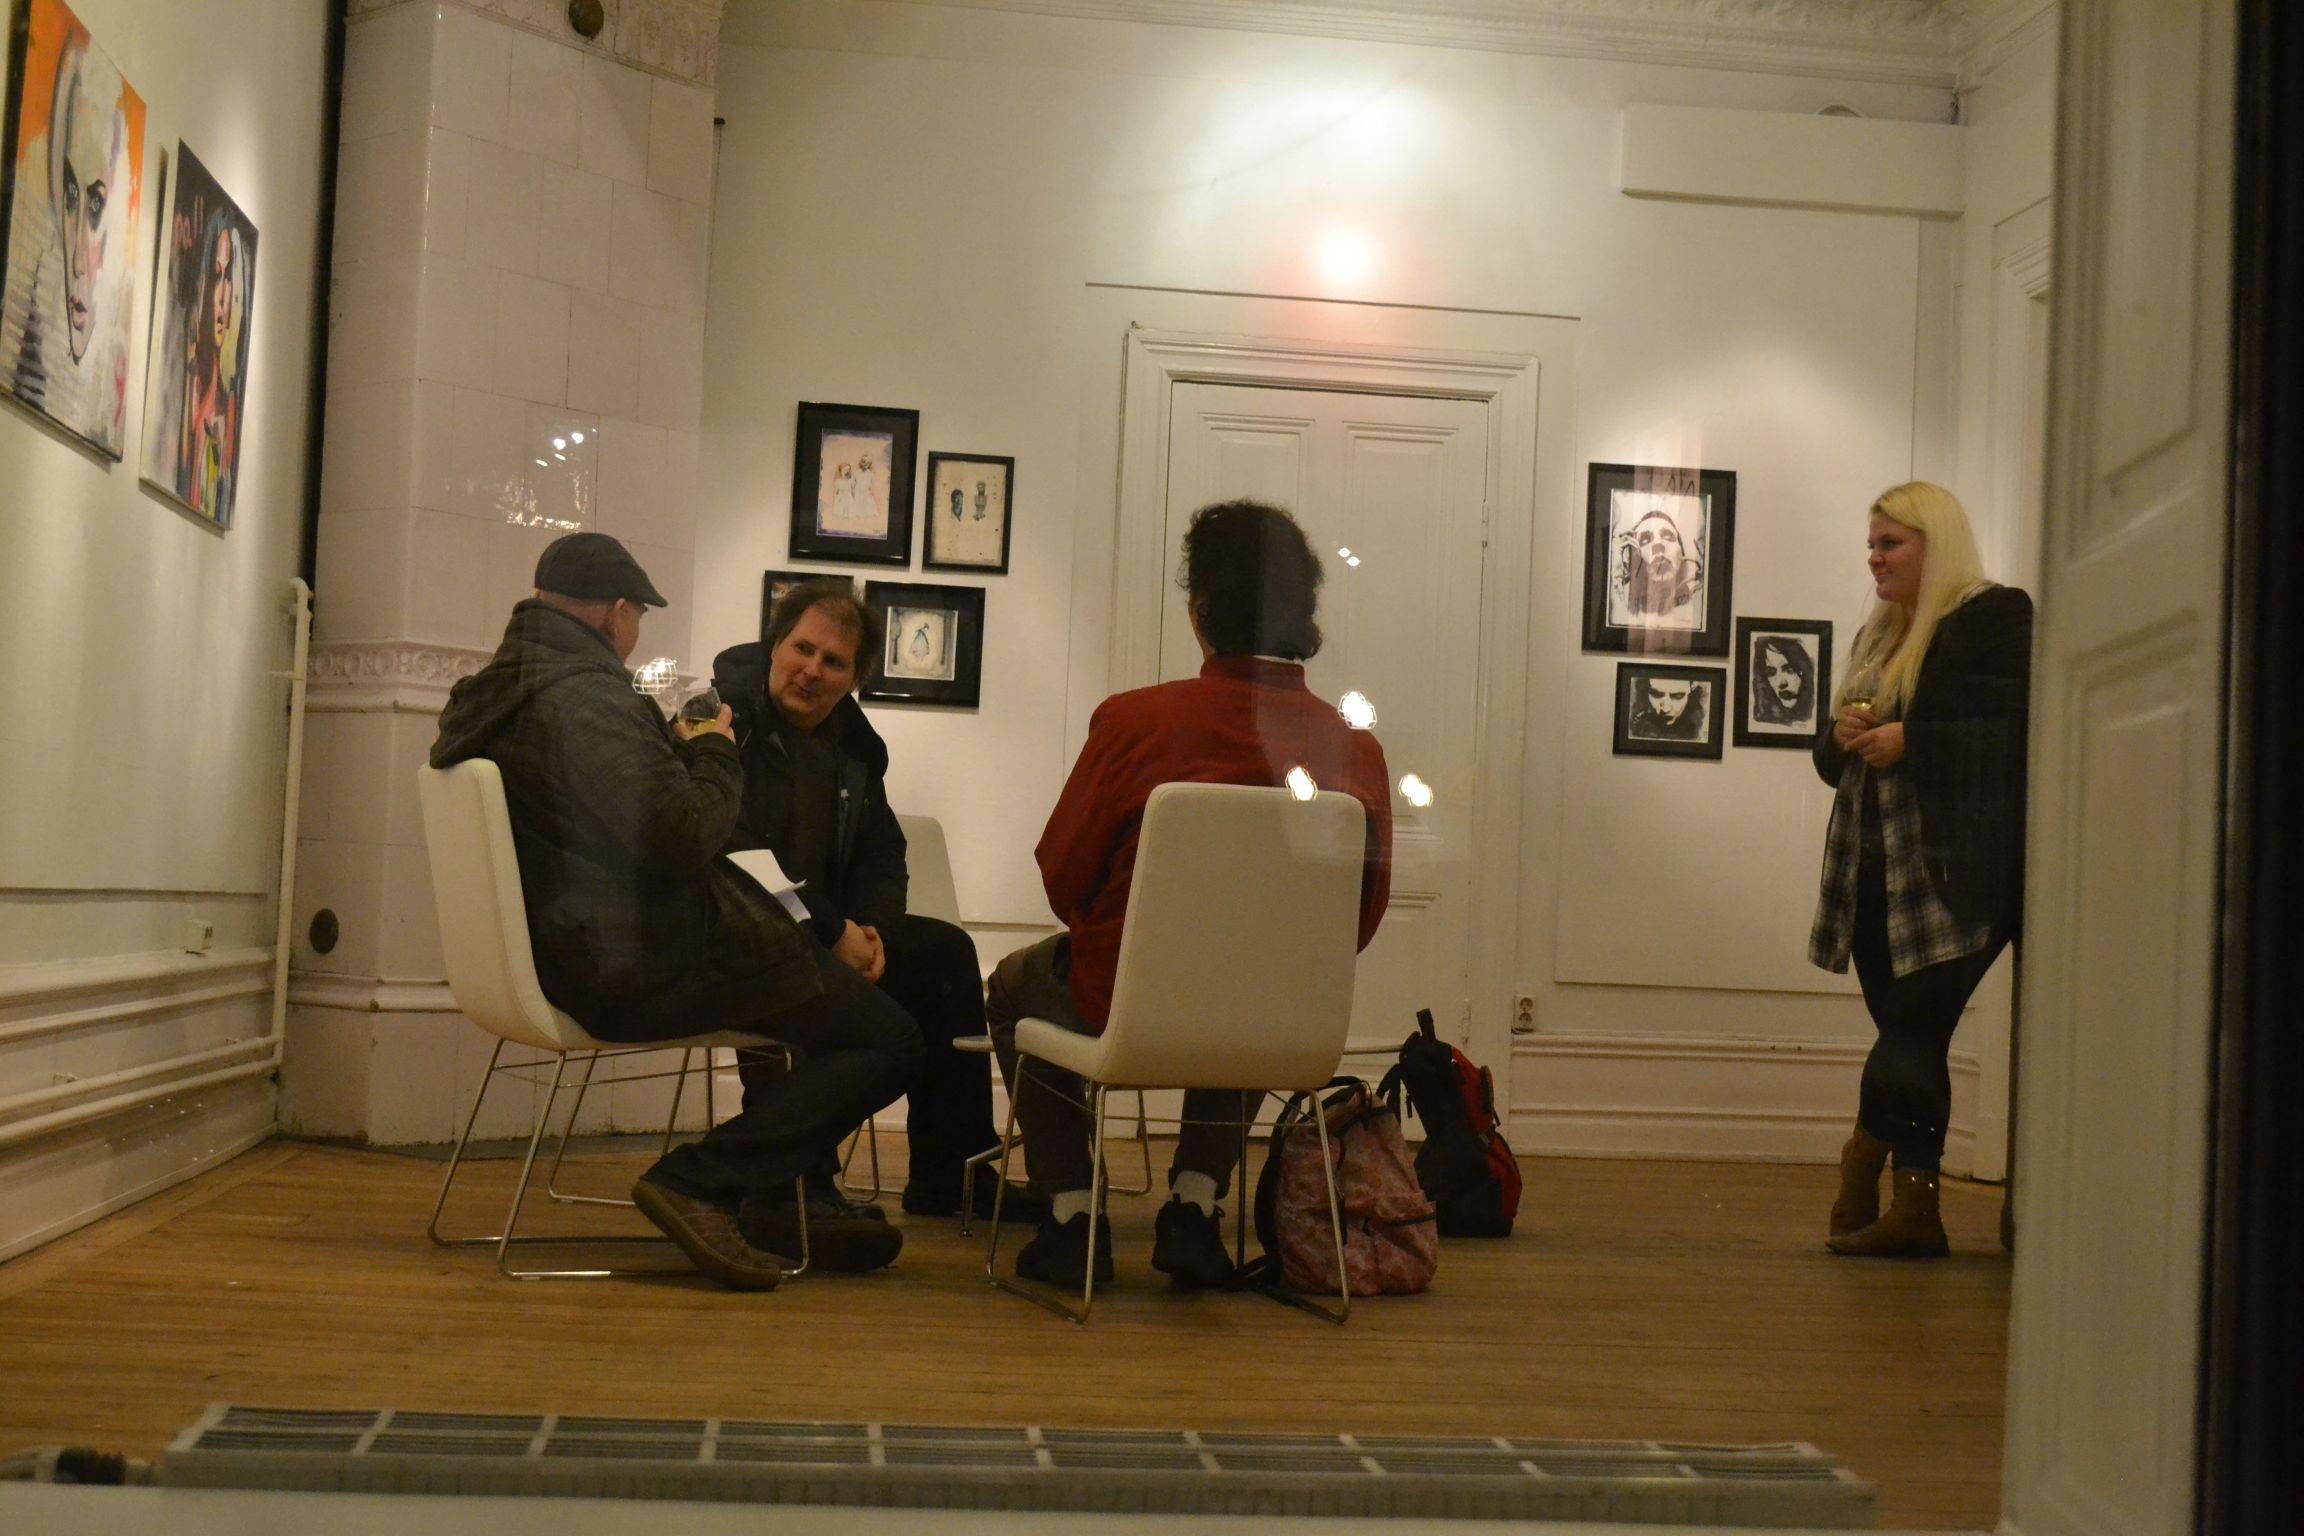 Konst vernissage torsdag galleri kocks kocksgatan 18 2